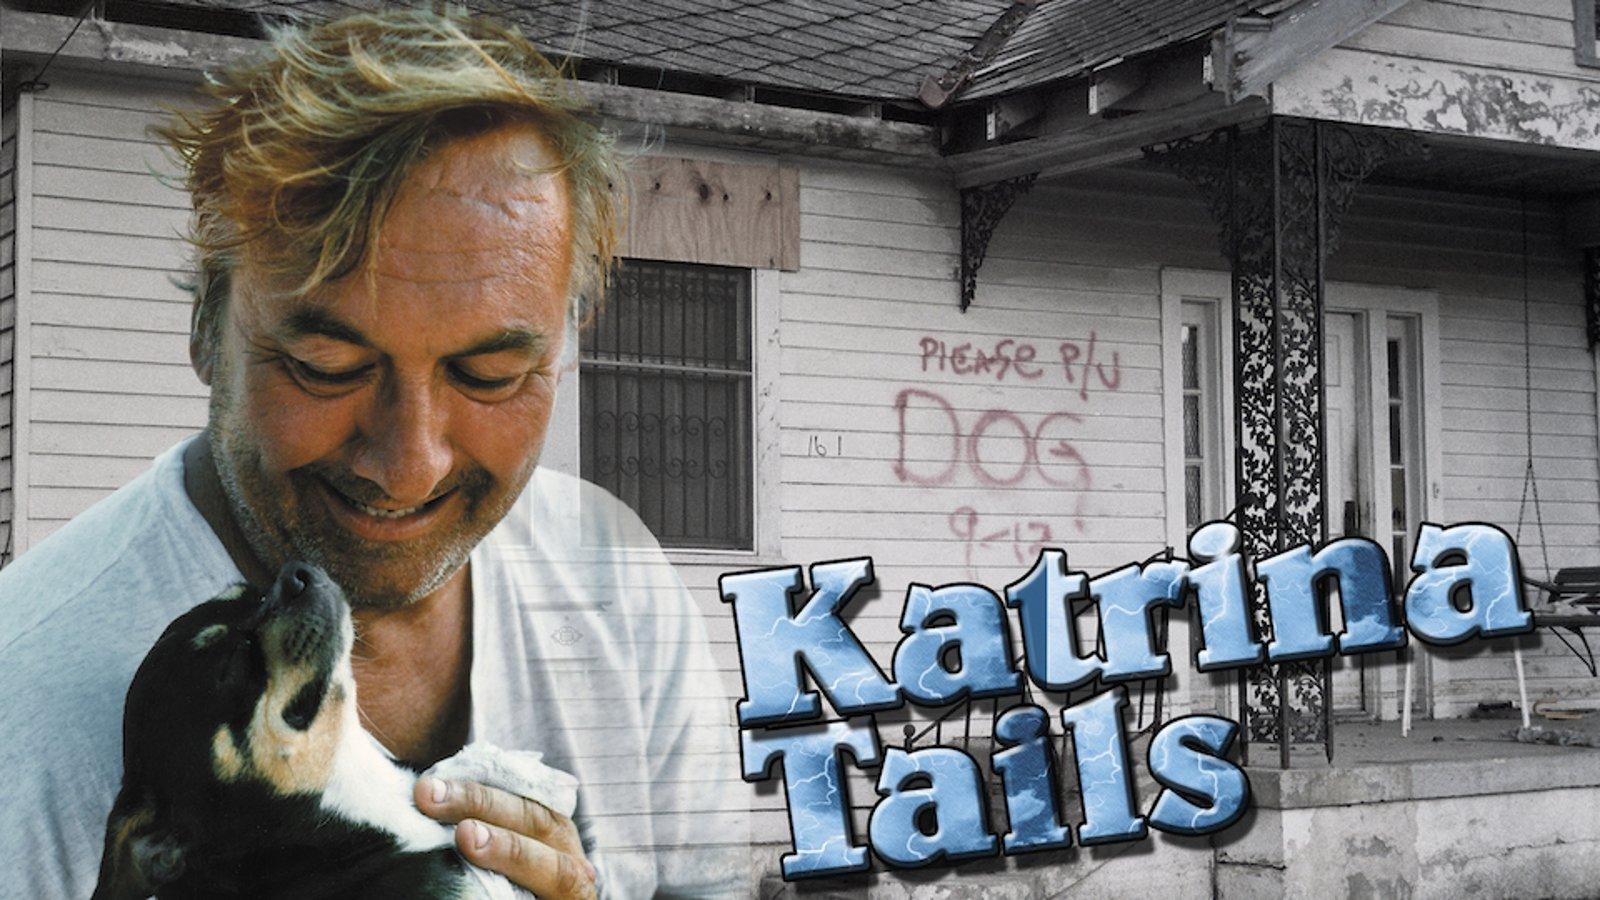 Katrina Tails - Reunited with Pets after Hurricane Katrina